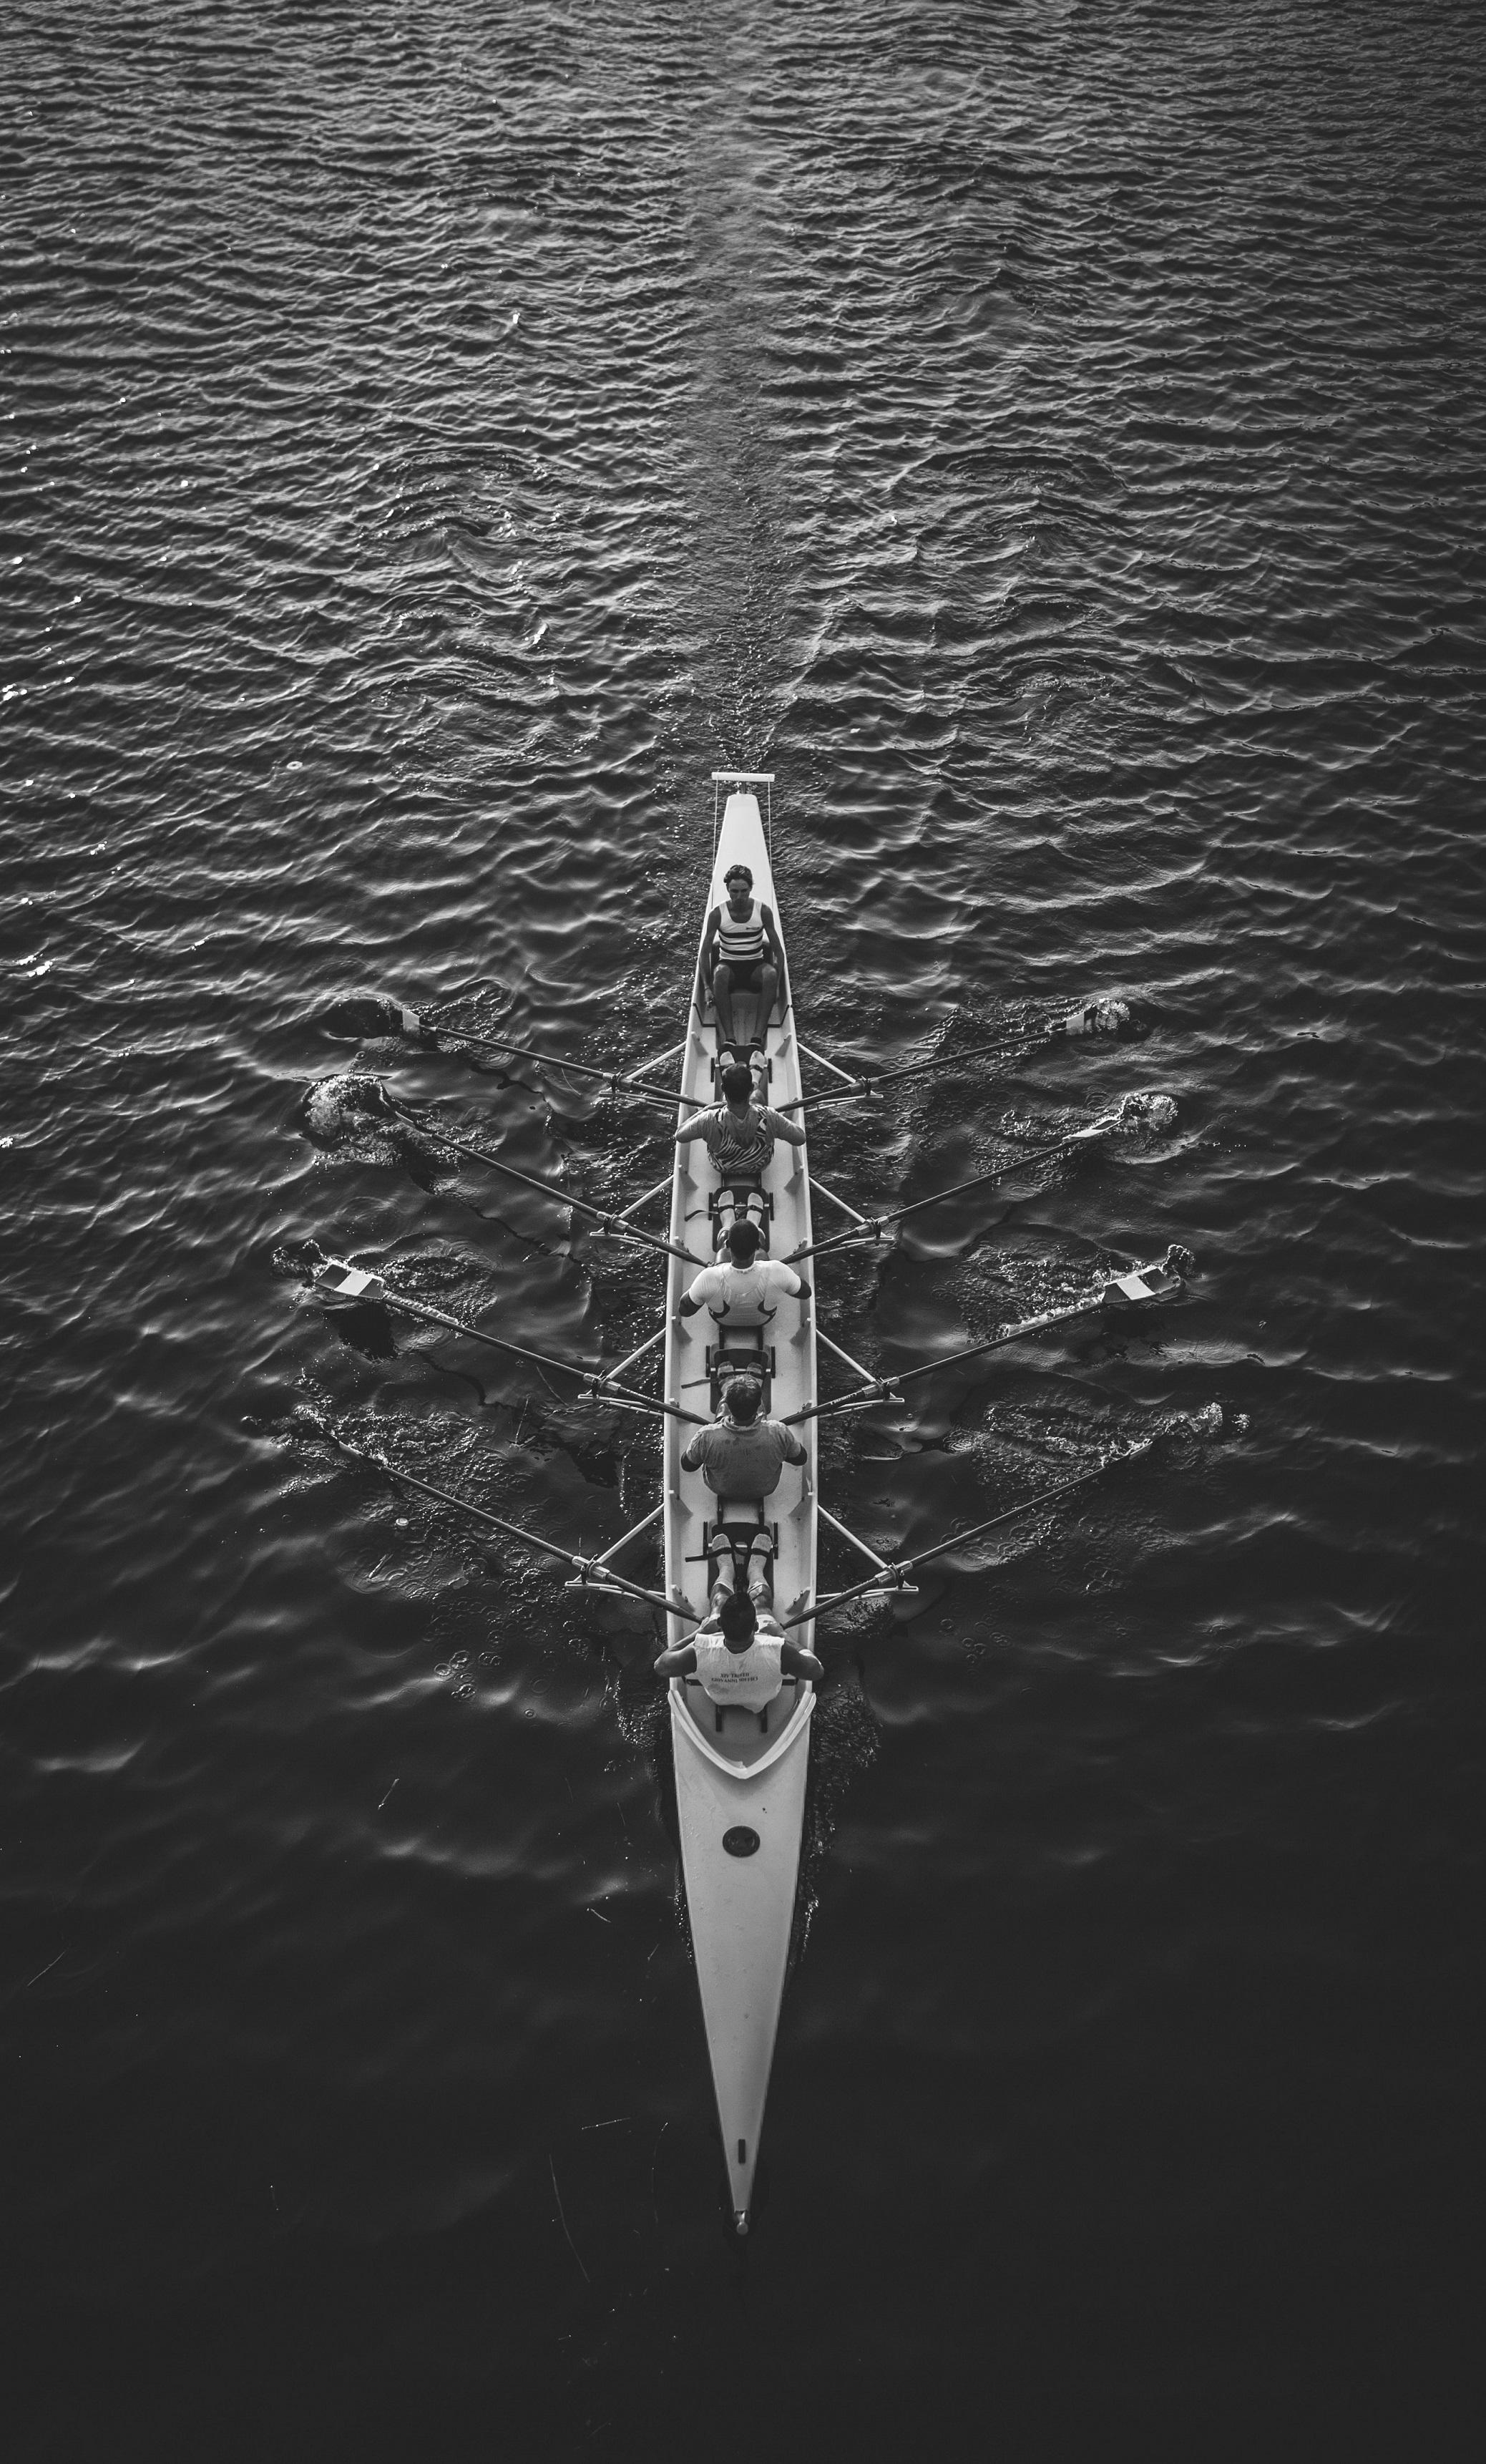 Row, Row, Rowing to the Olympics at Trent University